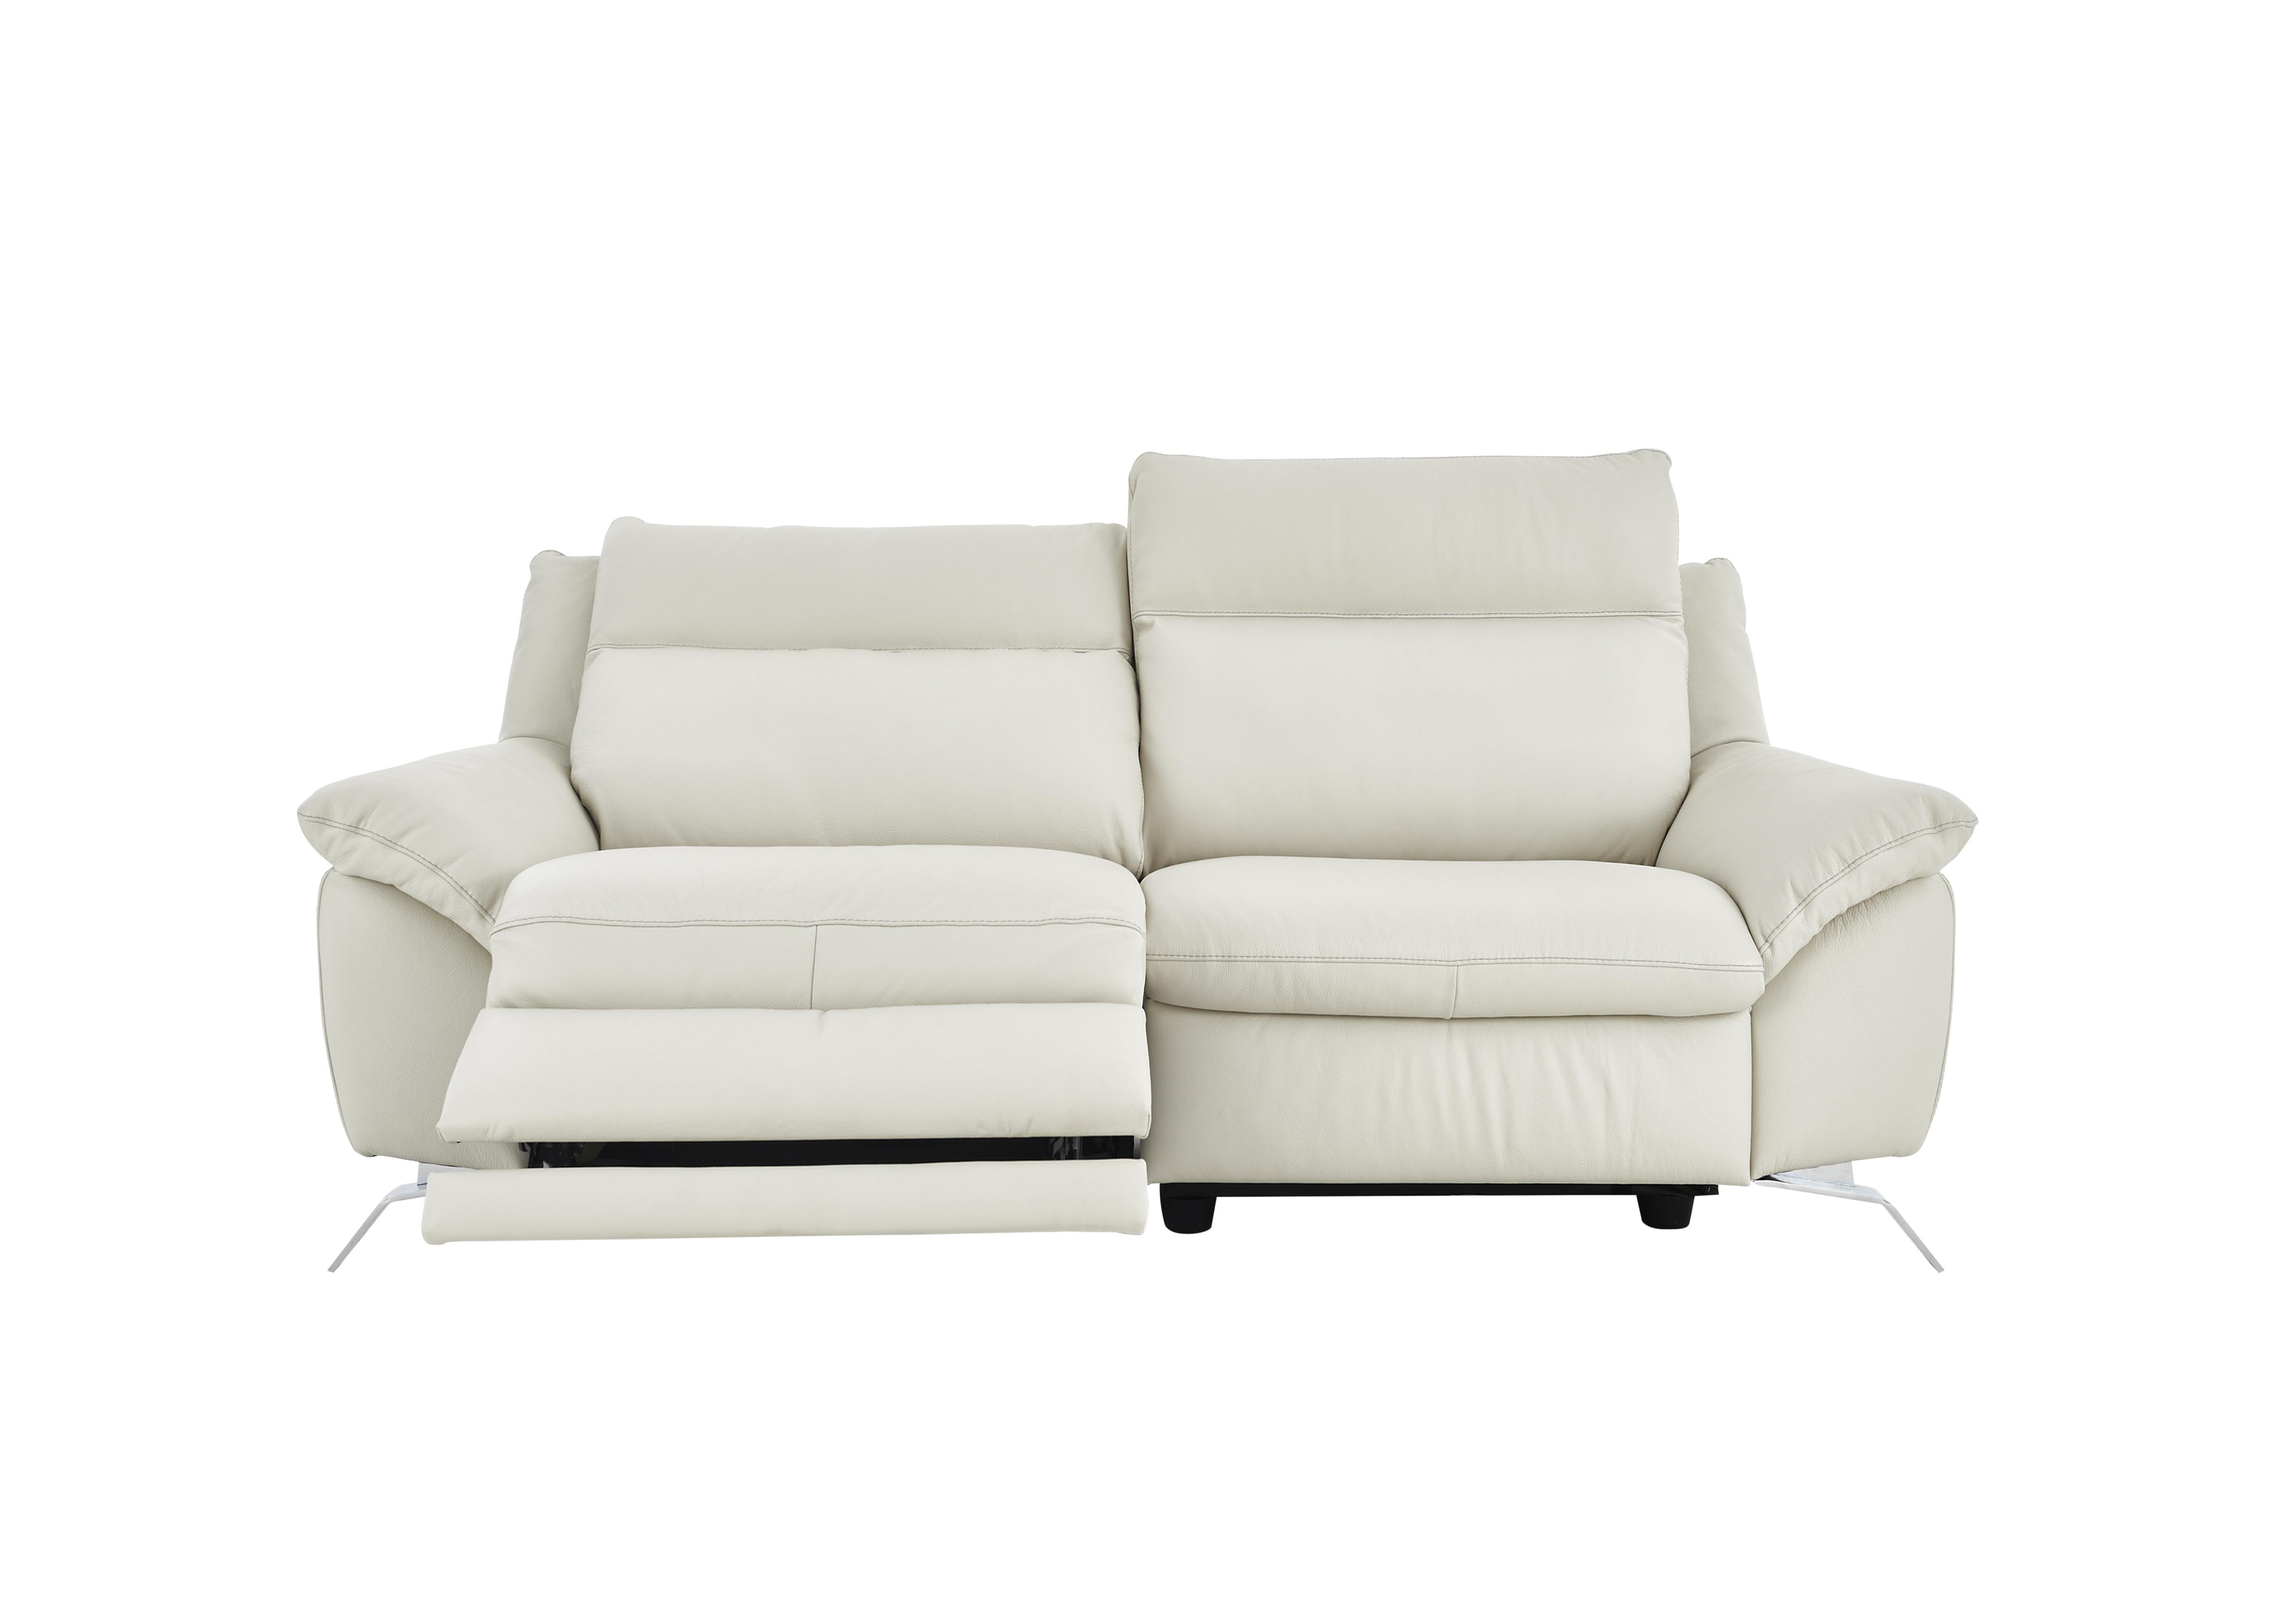 Napoli 2 Seater Leather Recliner Sofa  Natuzzi Editions